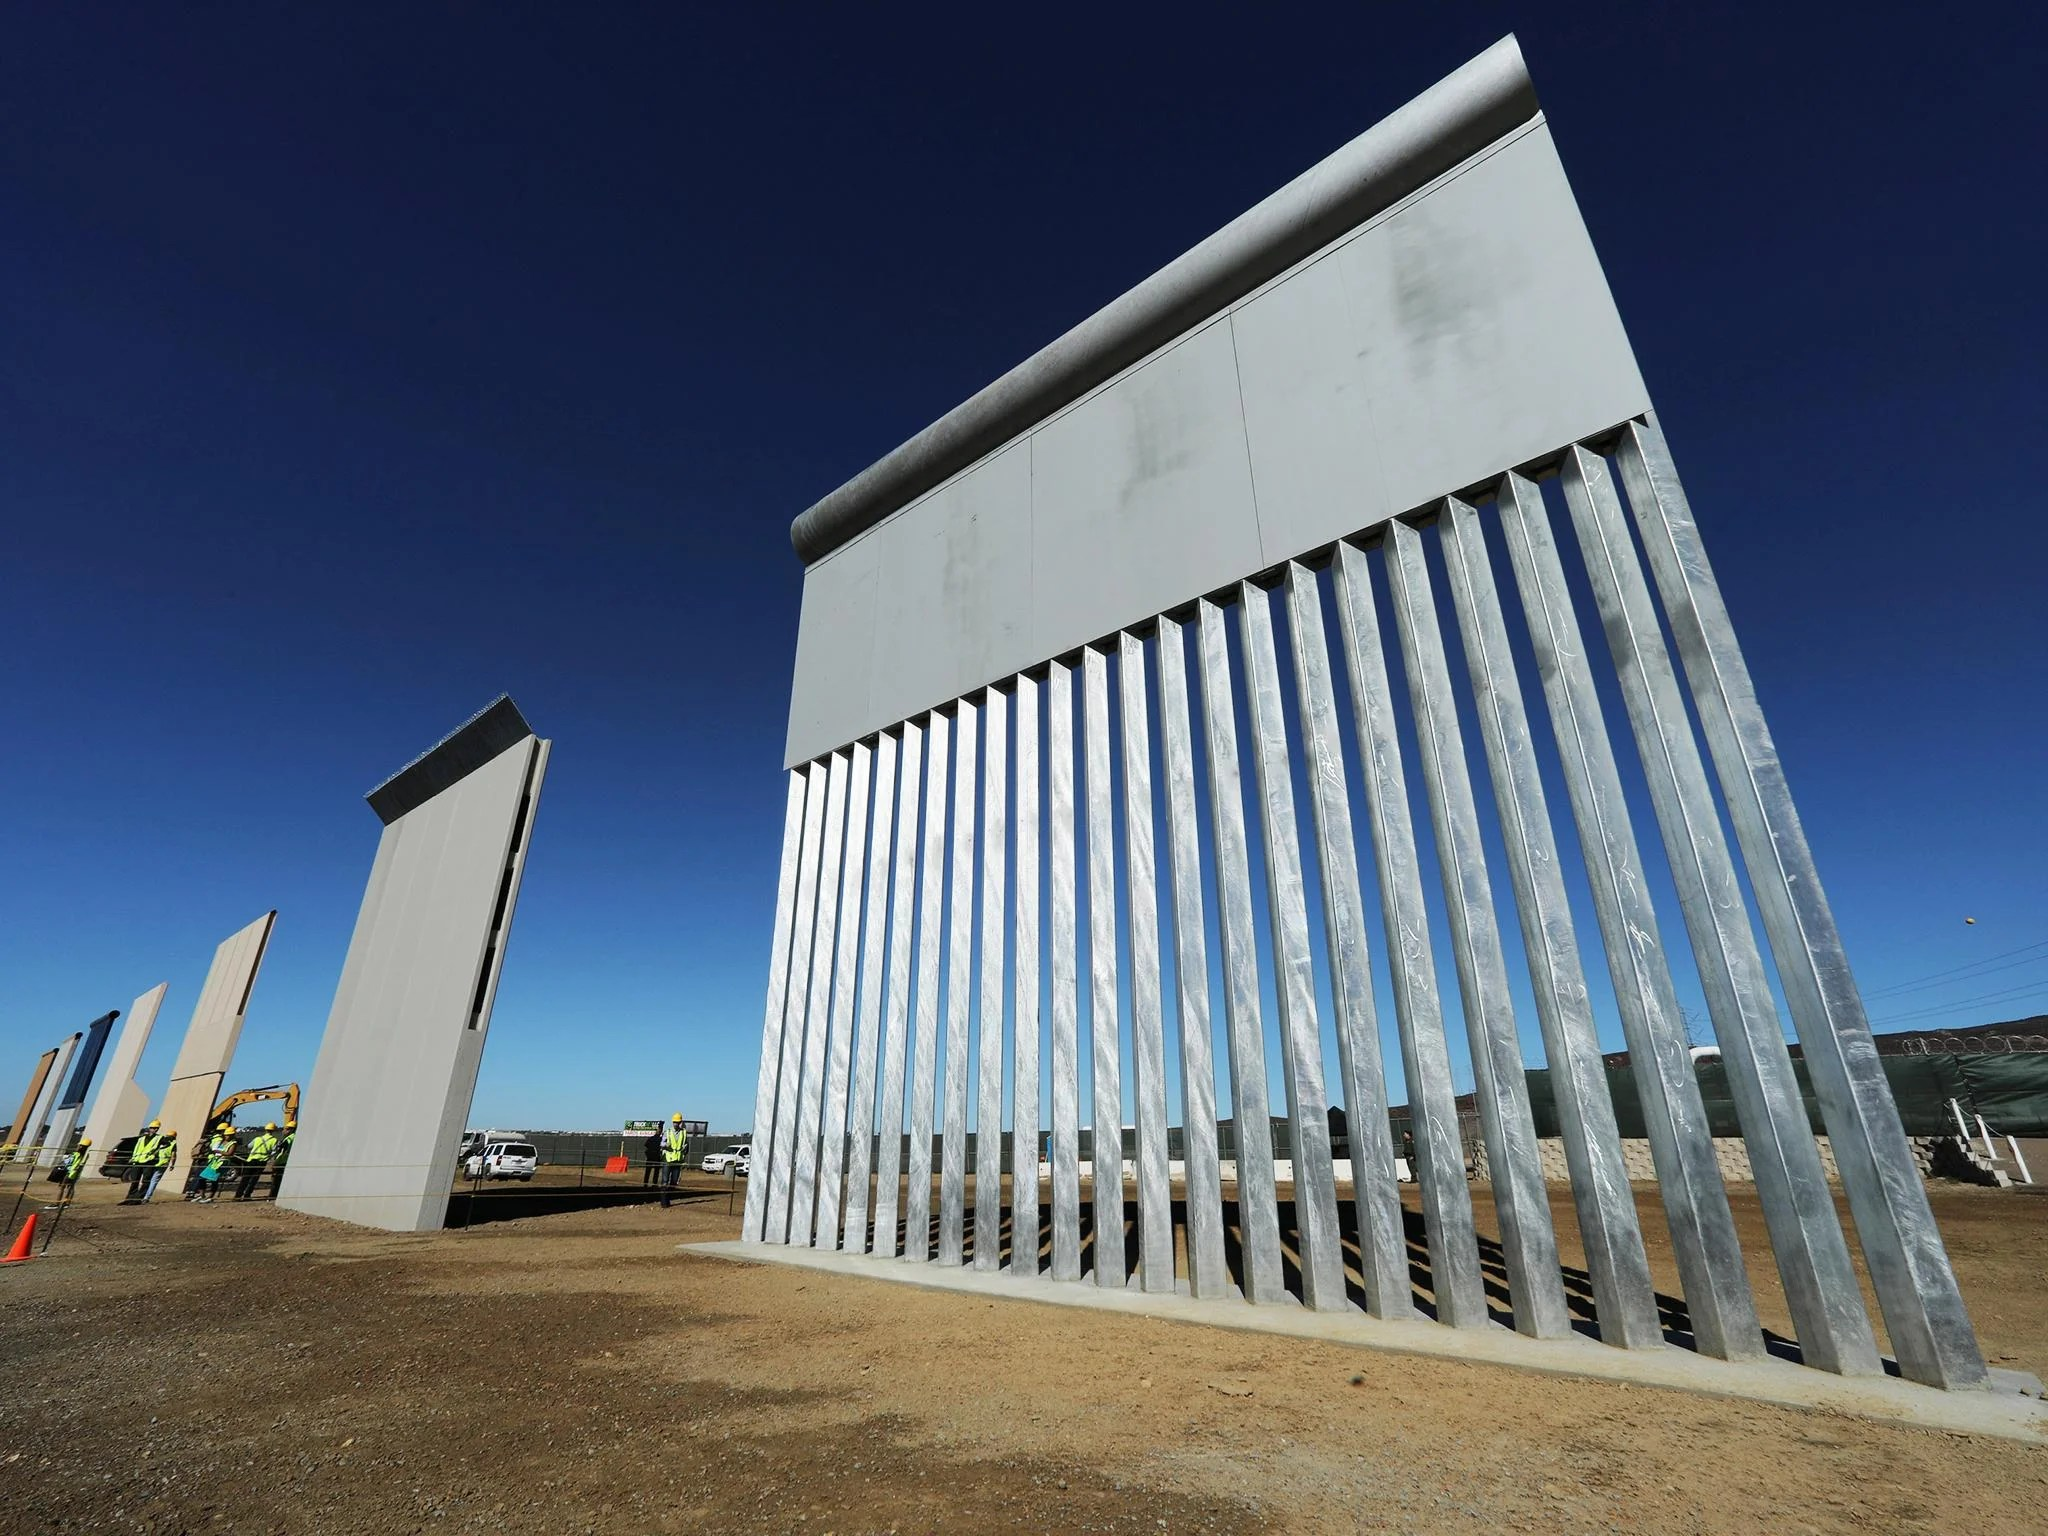 Trump border wall prototypes: Which design will win